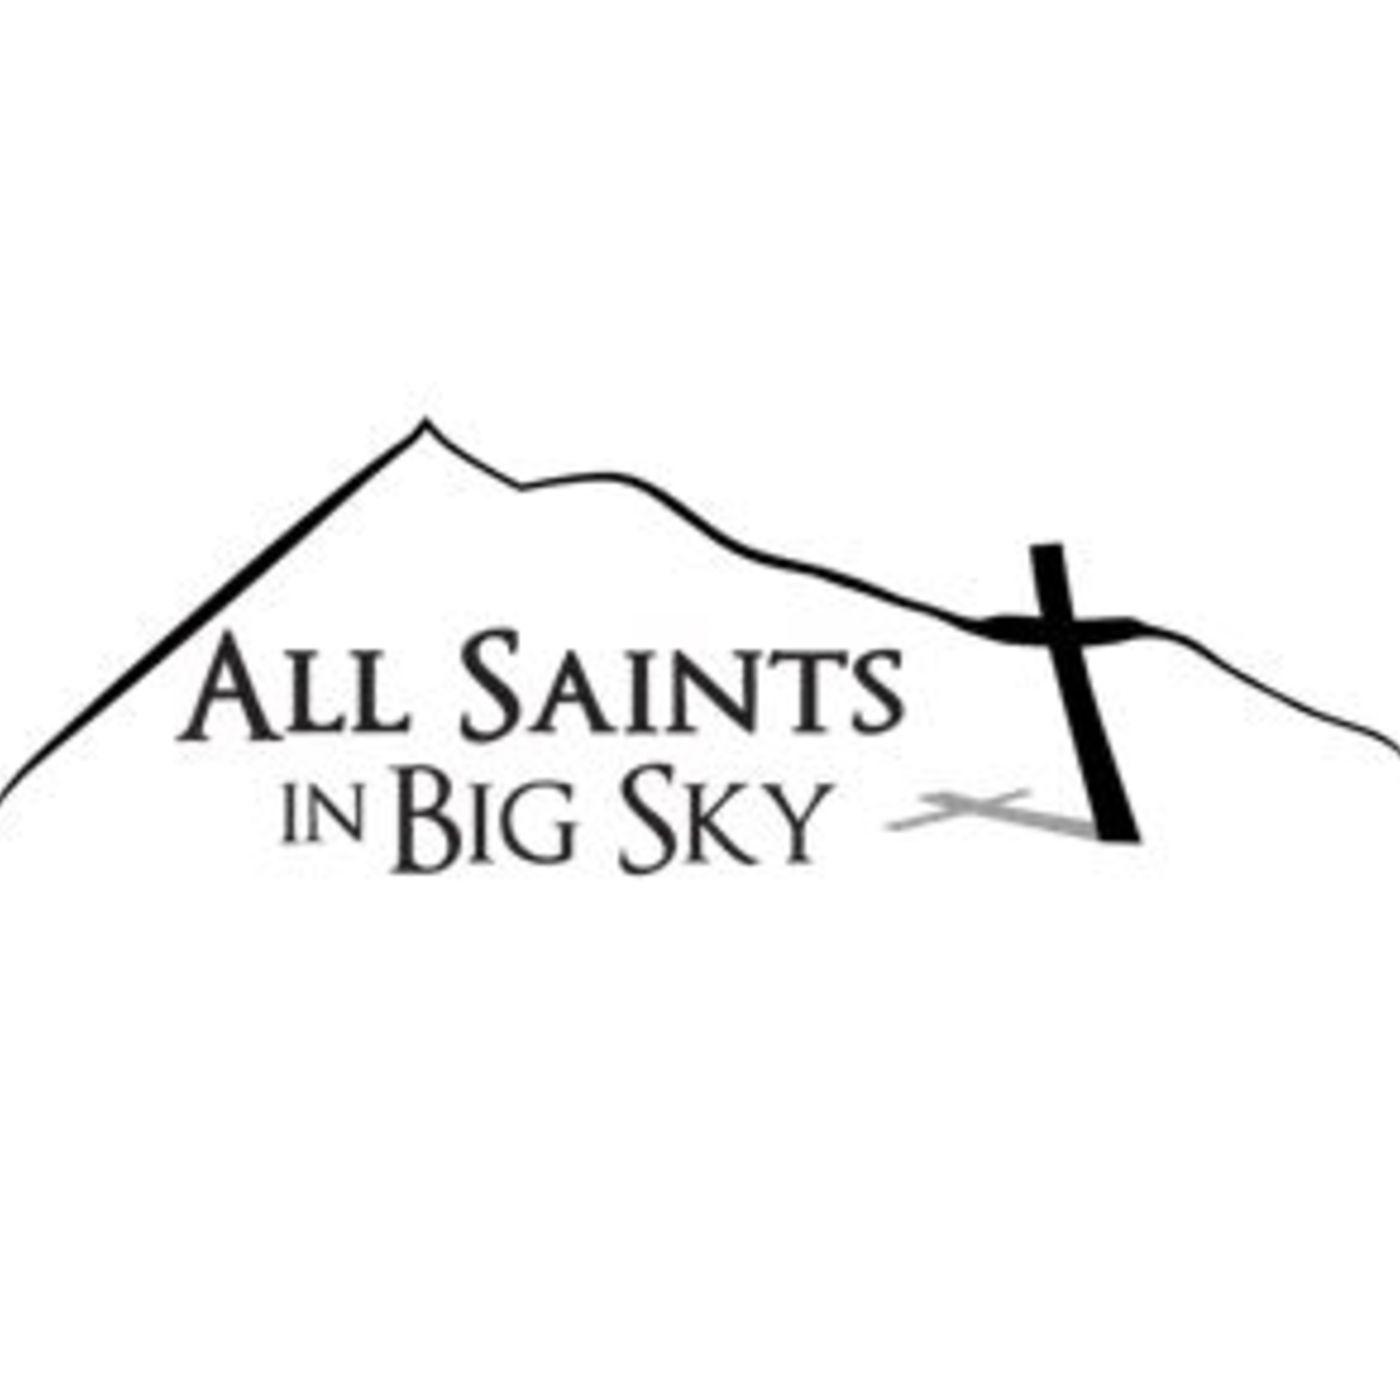 All Saints in Big Sky